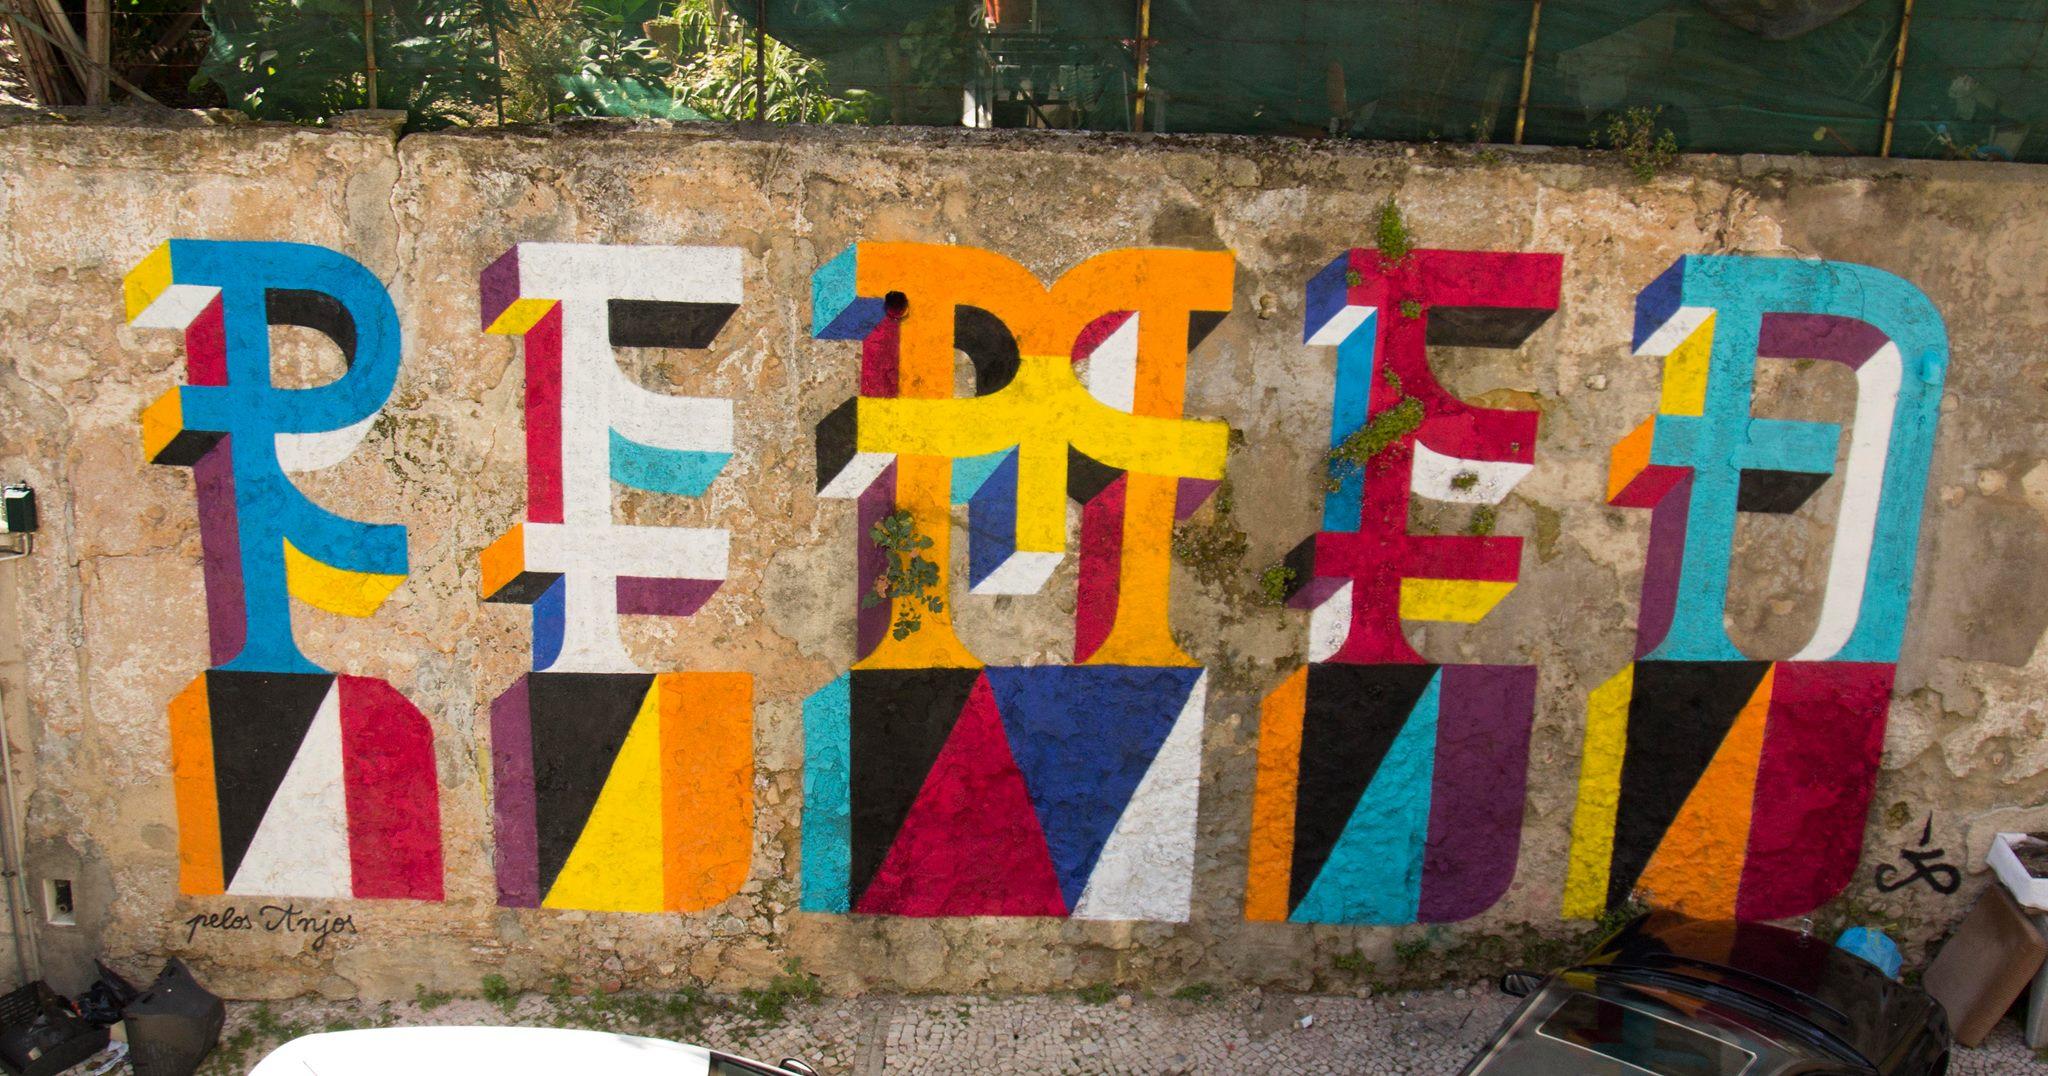 remed-new-mural-in-regueirao-dos-anjos-lisbon-01